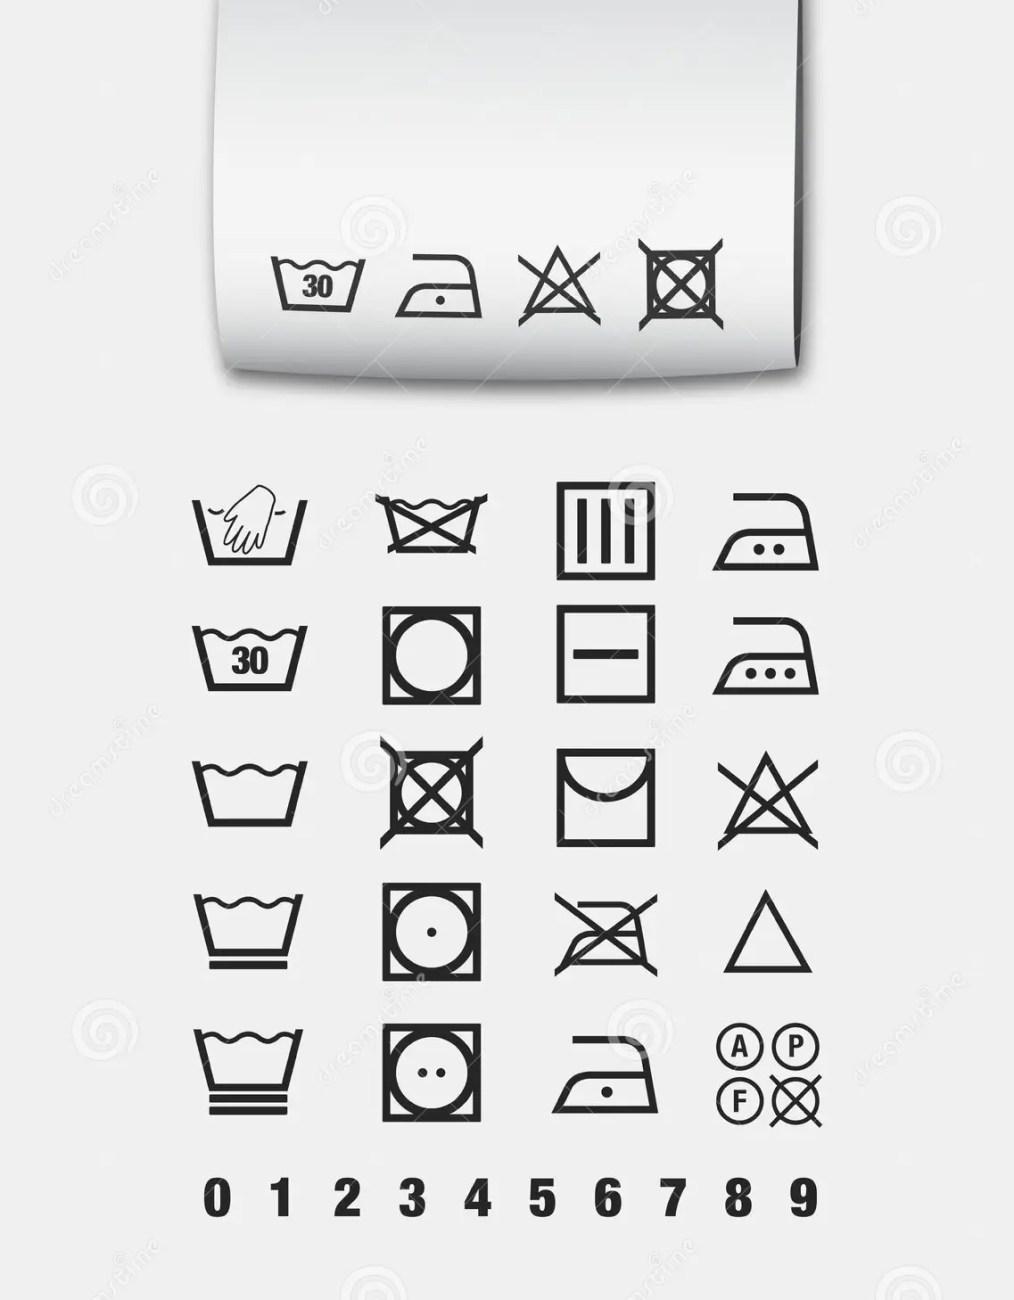 Bleach pictogram wallpapergenk washing symbols stock vector ilration of laundry 23298982 biocorpaavc Choice Image